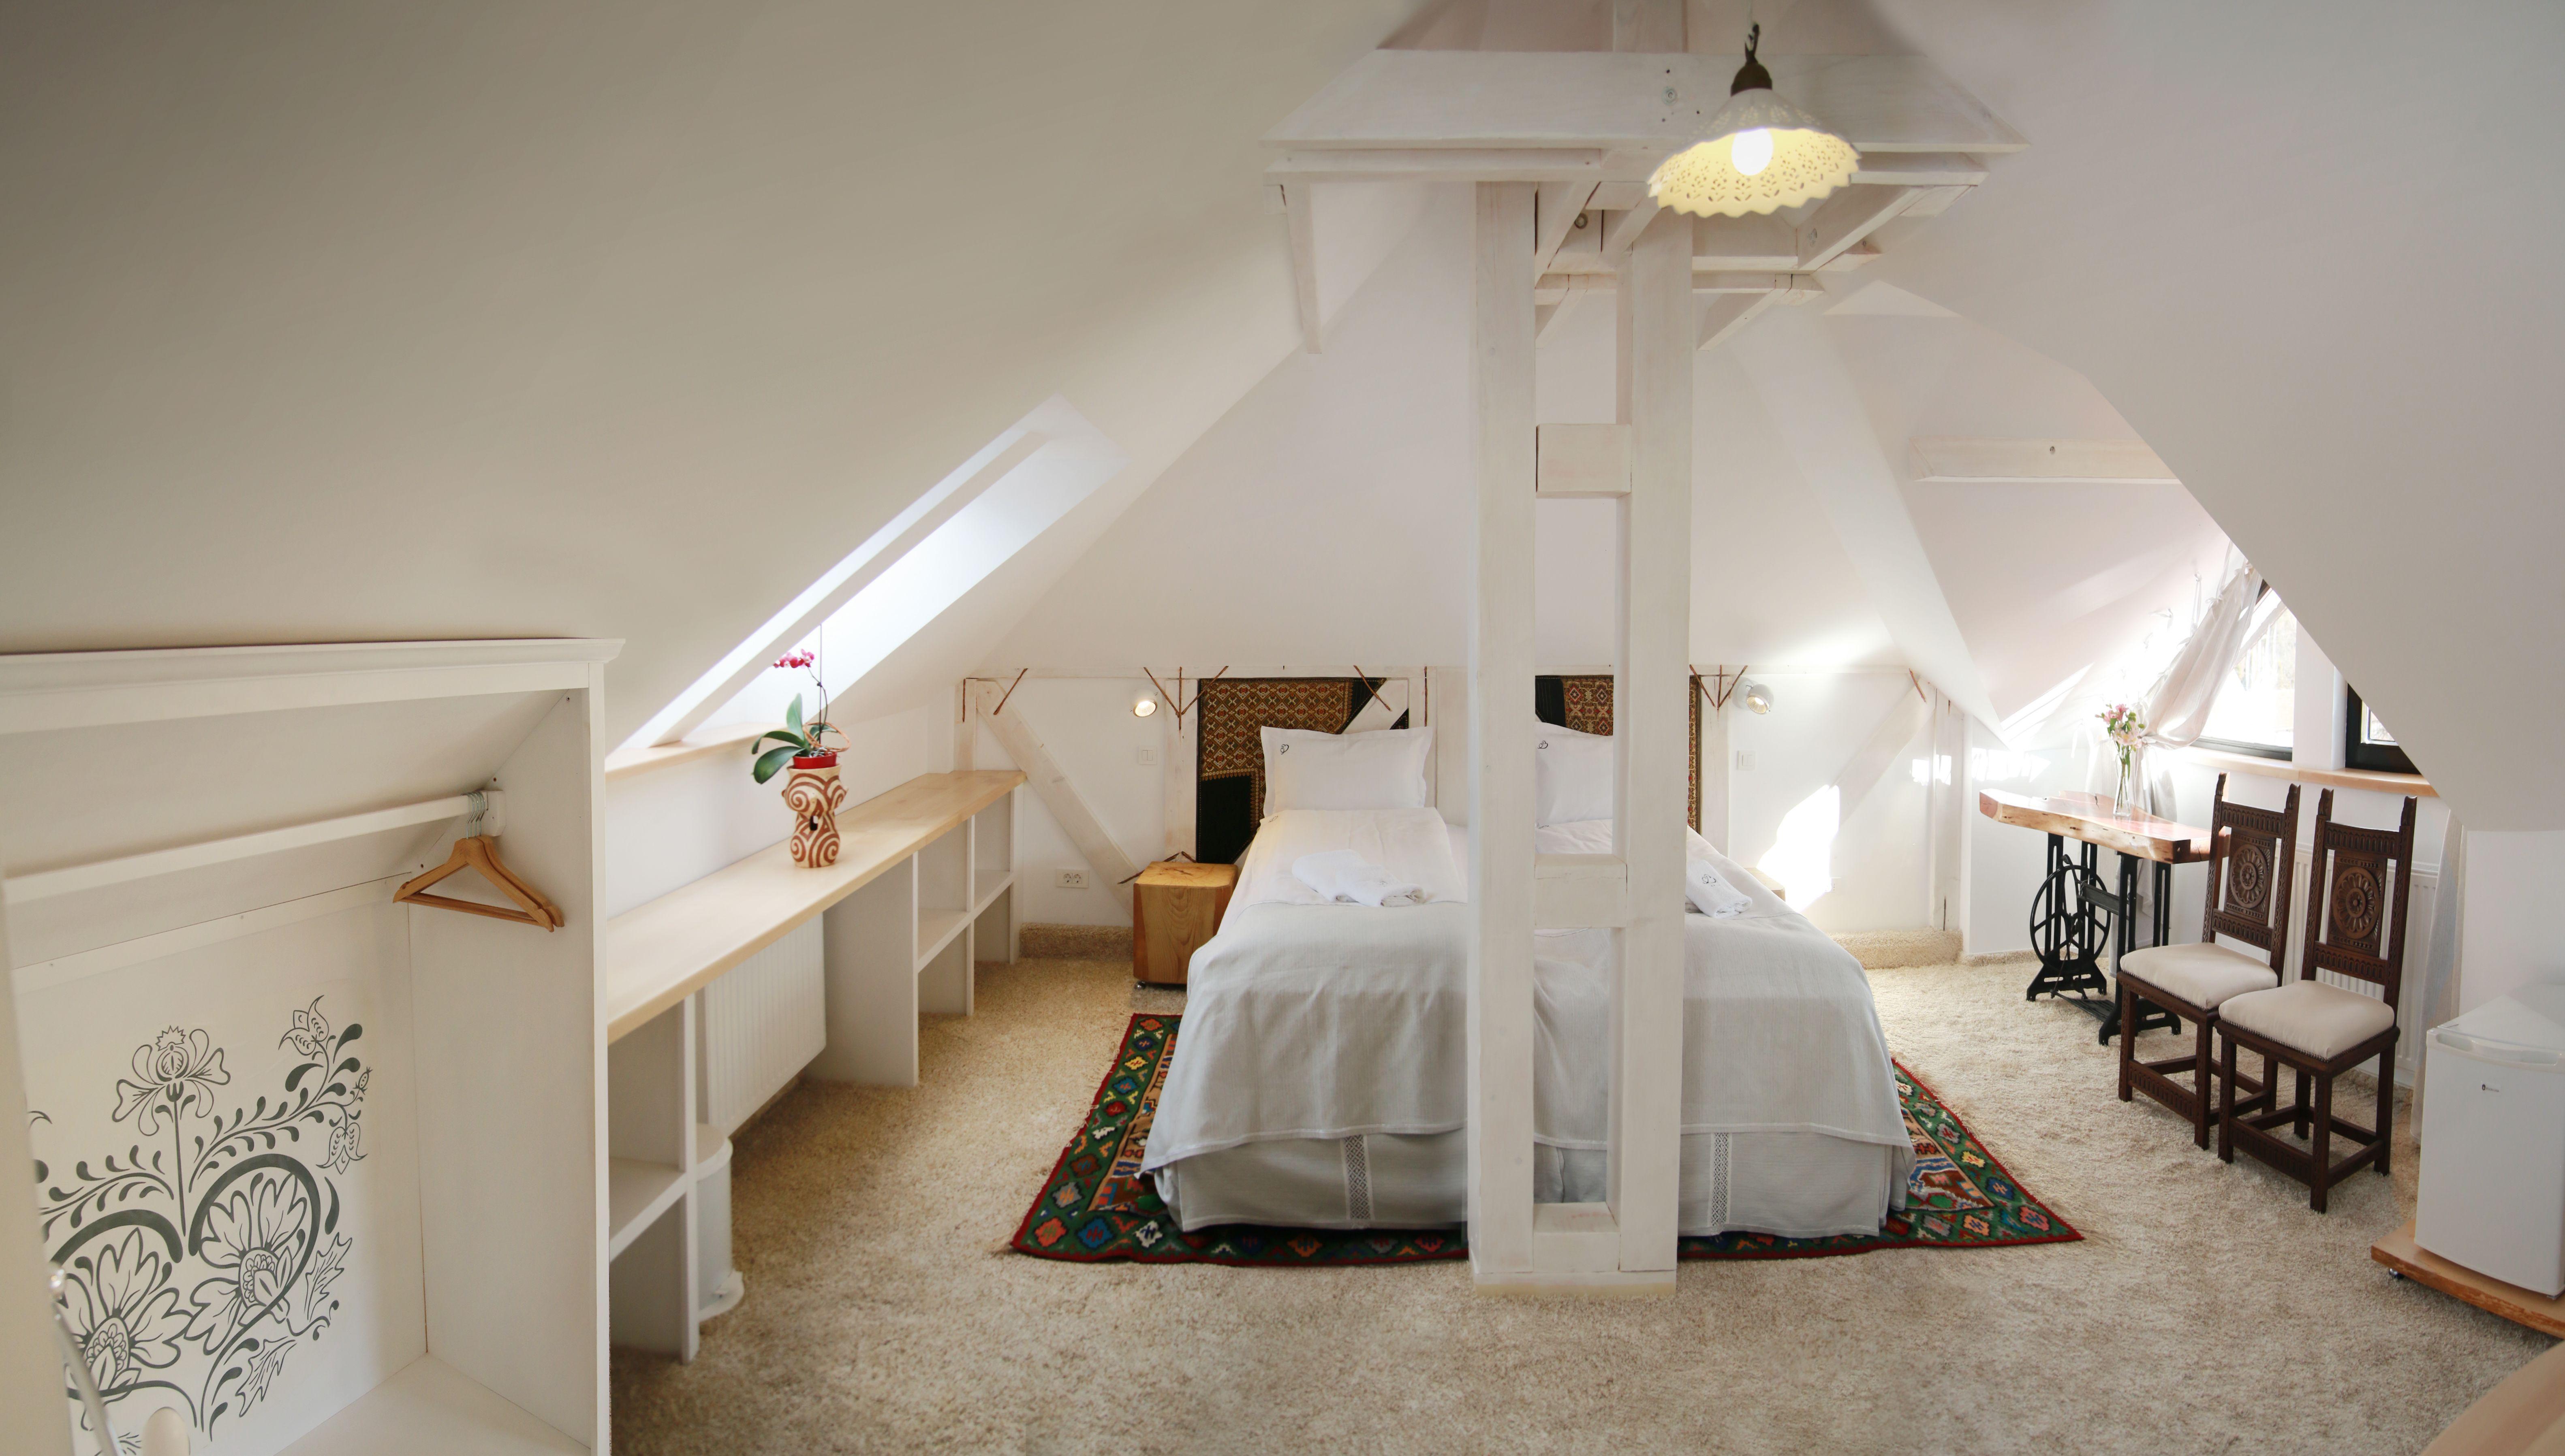 Tr traditional bedroom designs for couples - Traditional Decor Conac Boutique Hotel Conacul Bratescu Bratescu Mansion Bran Brasov Romania